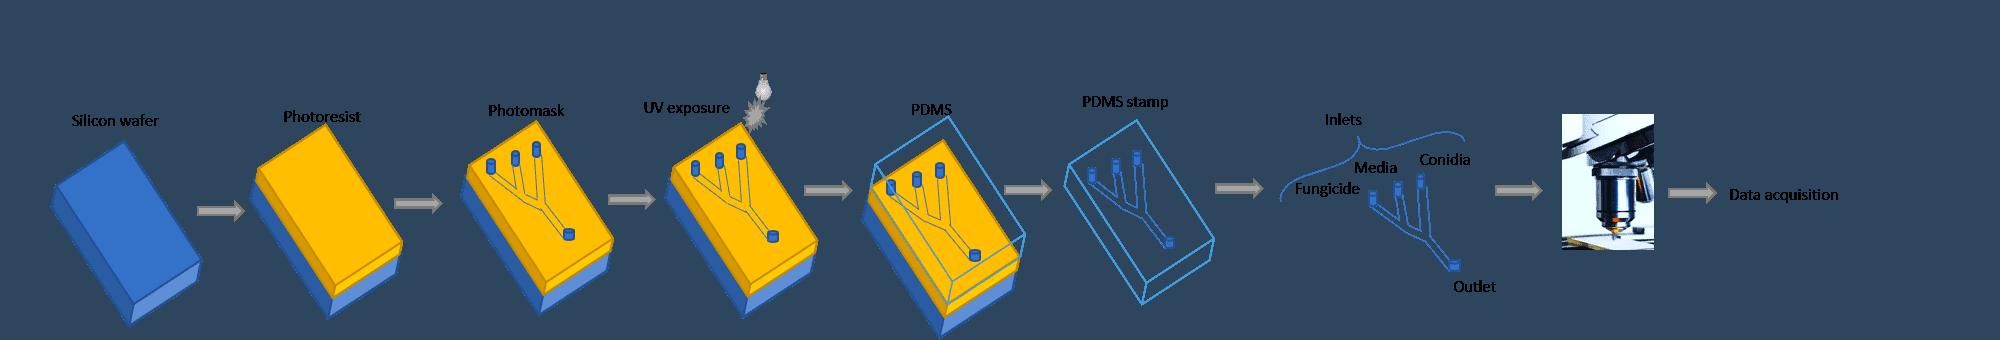 MAHT-FunSST_lab-on-chip_screening-Elvesys-chip